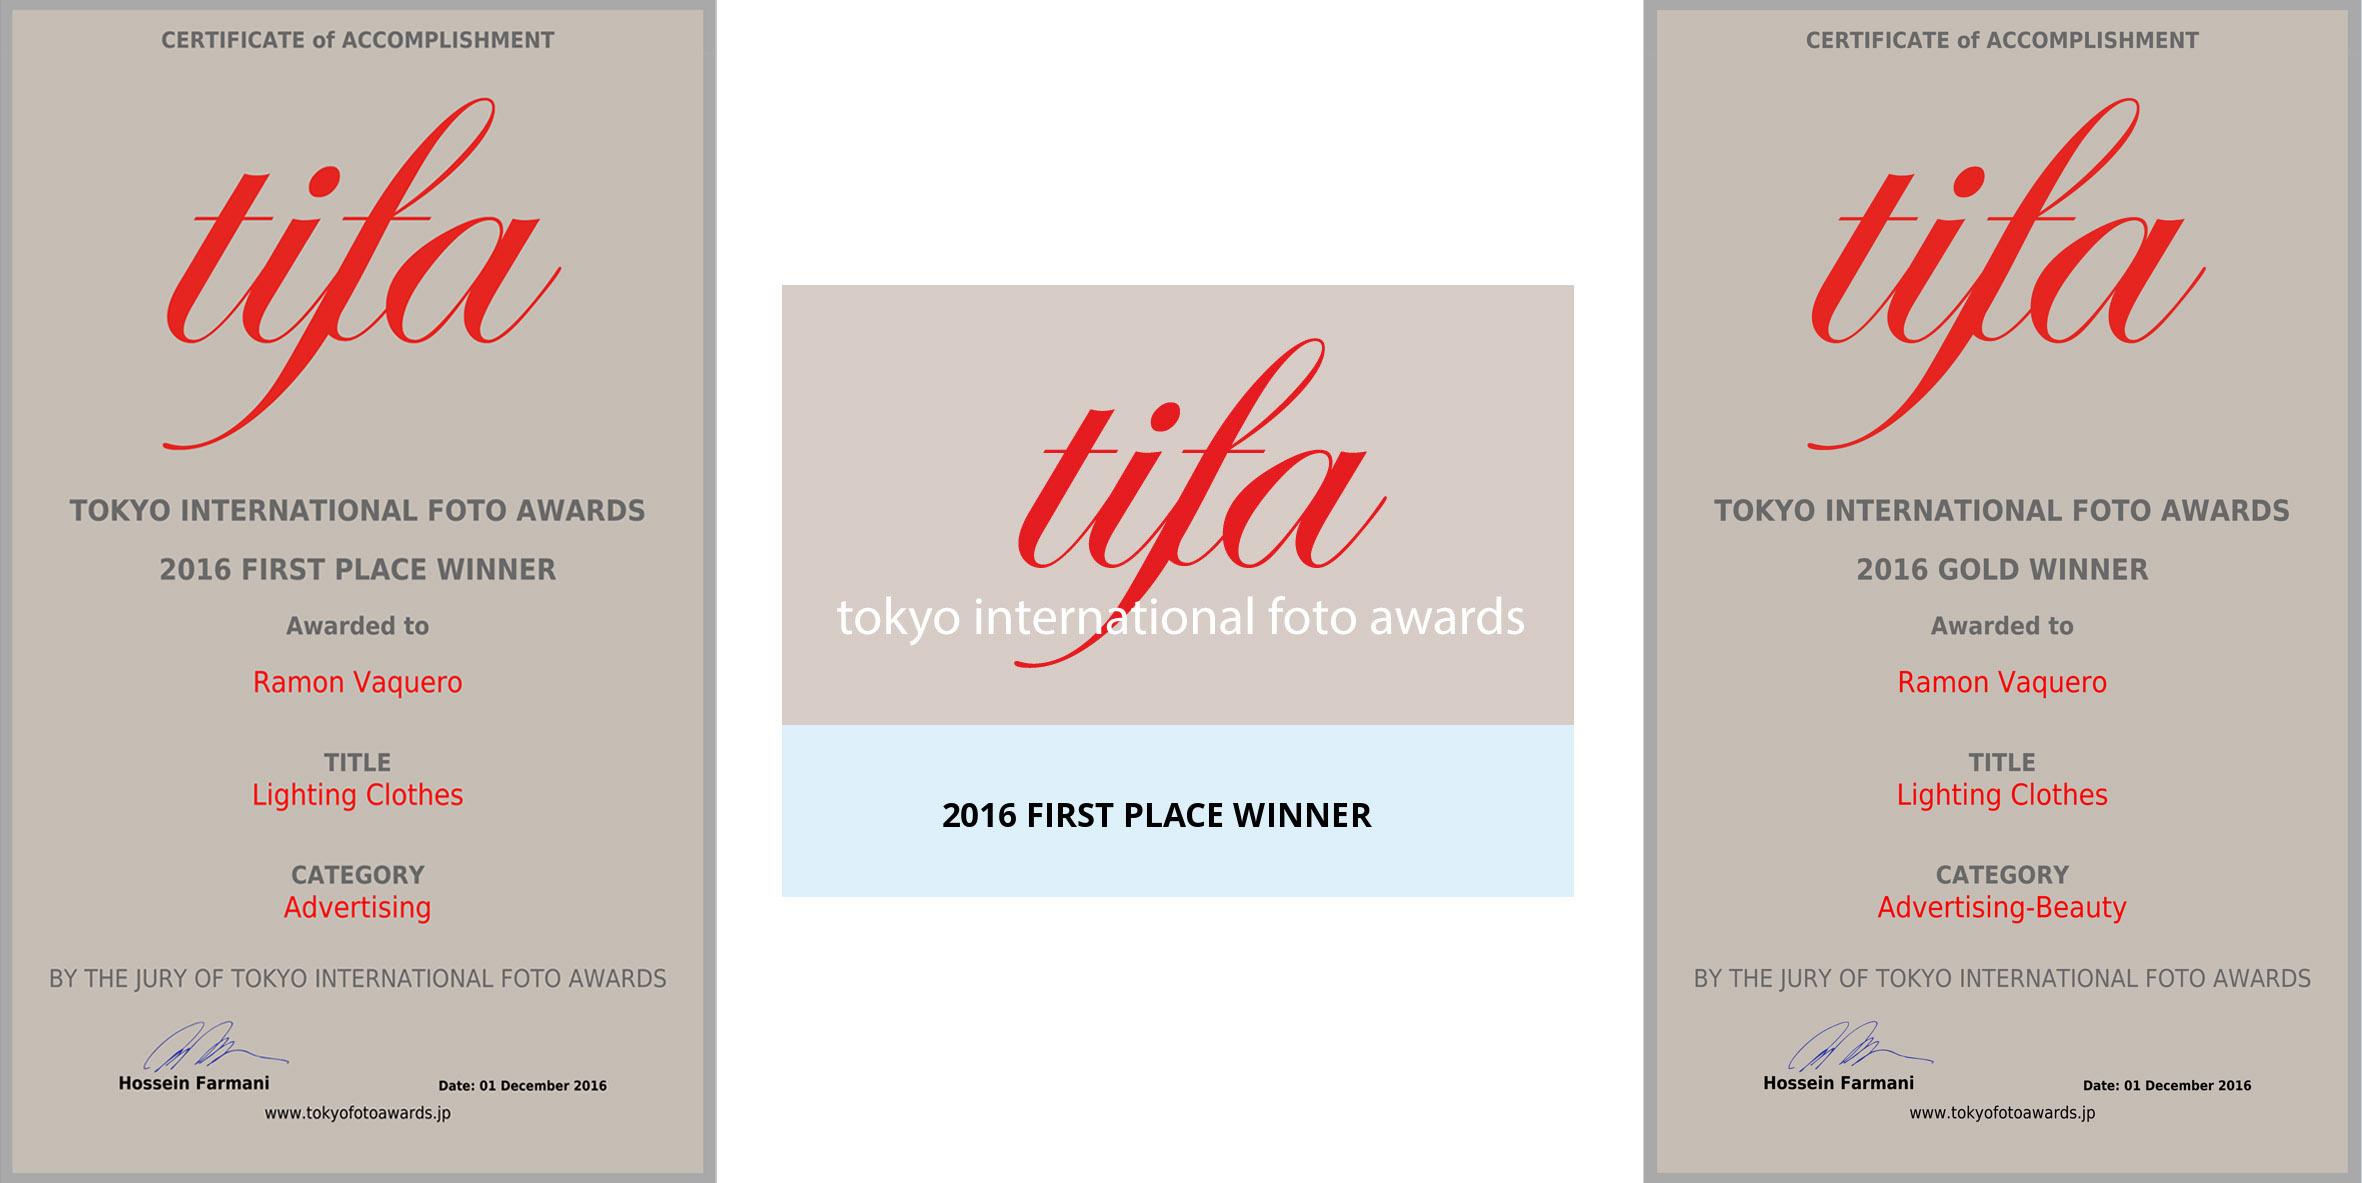 ramon vaquero_tokyo_international_foto_awards_belleza_publicidad_fotografos_vigo_españa_japan